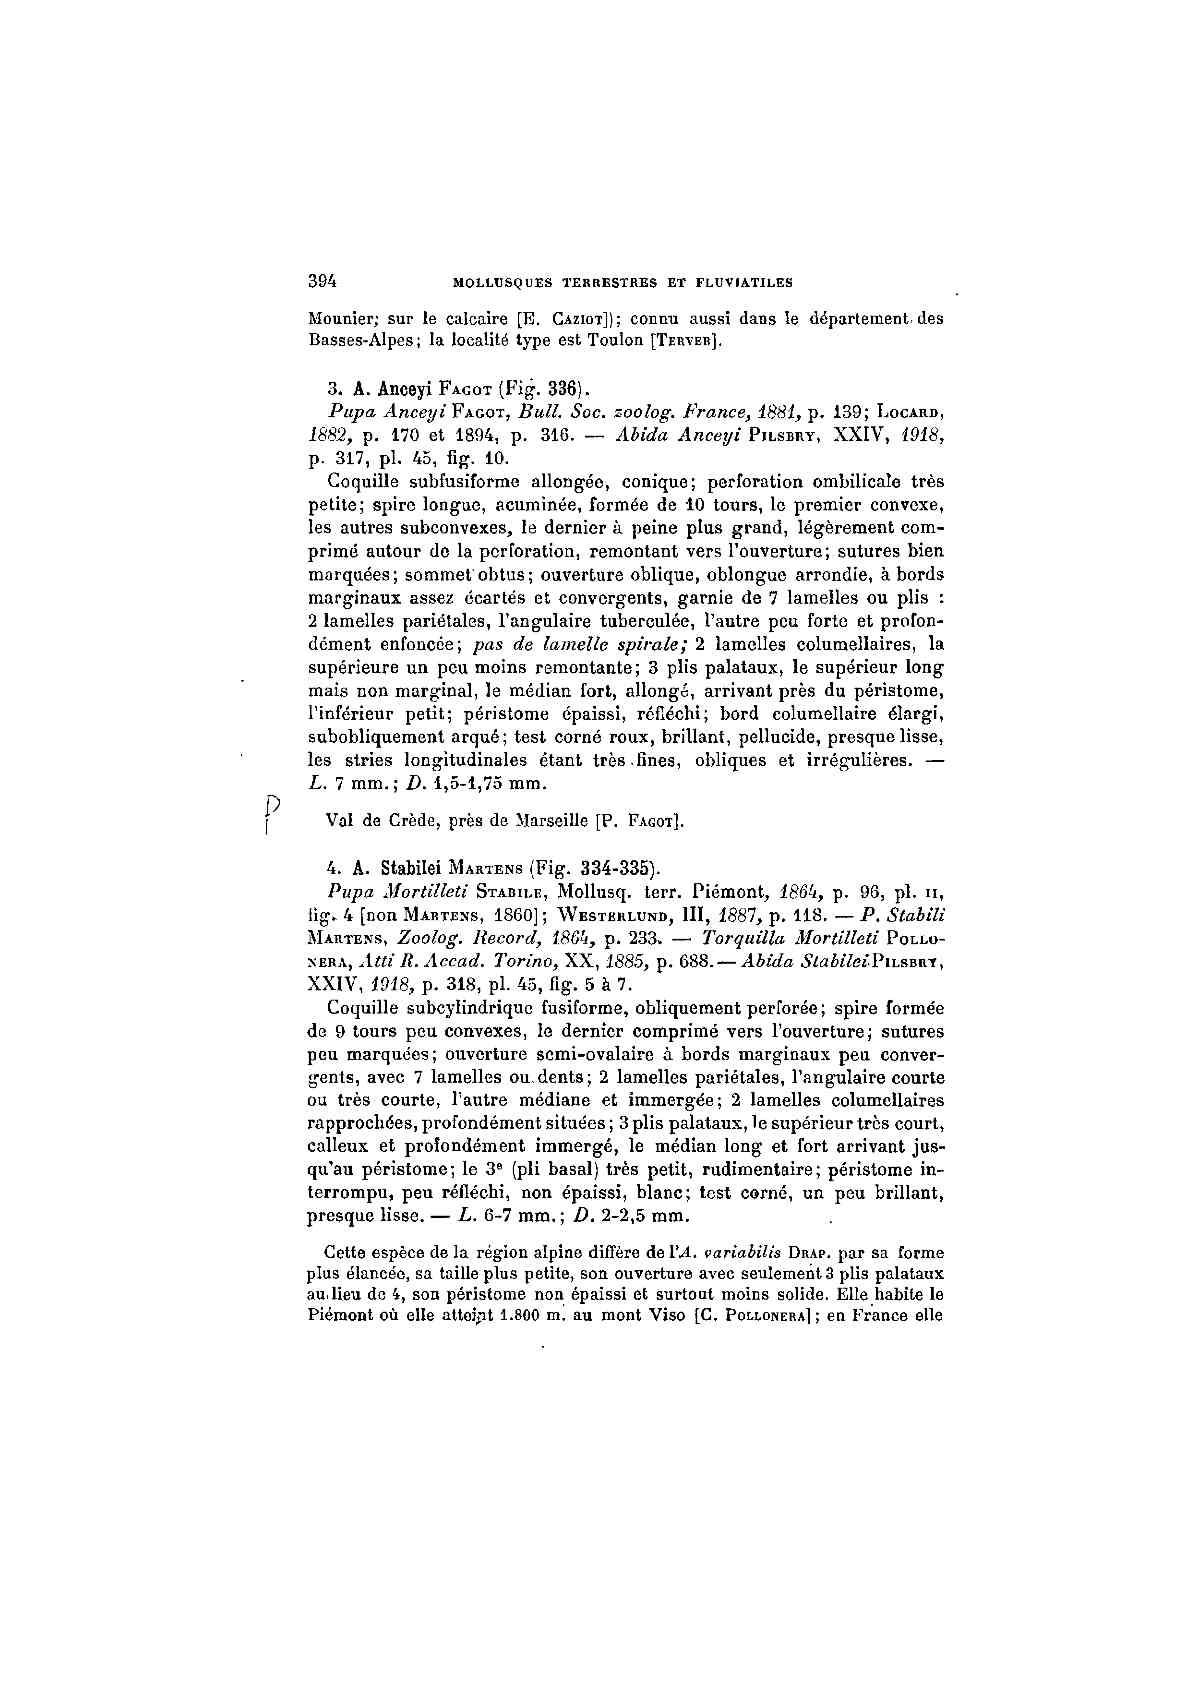 Granaria variabilis (Draparnaud, 1801)